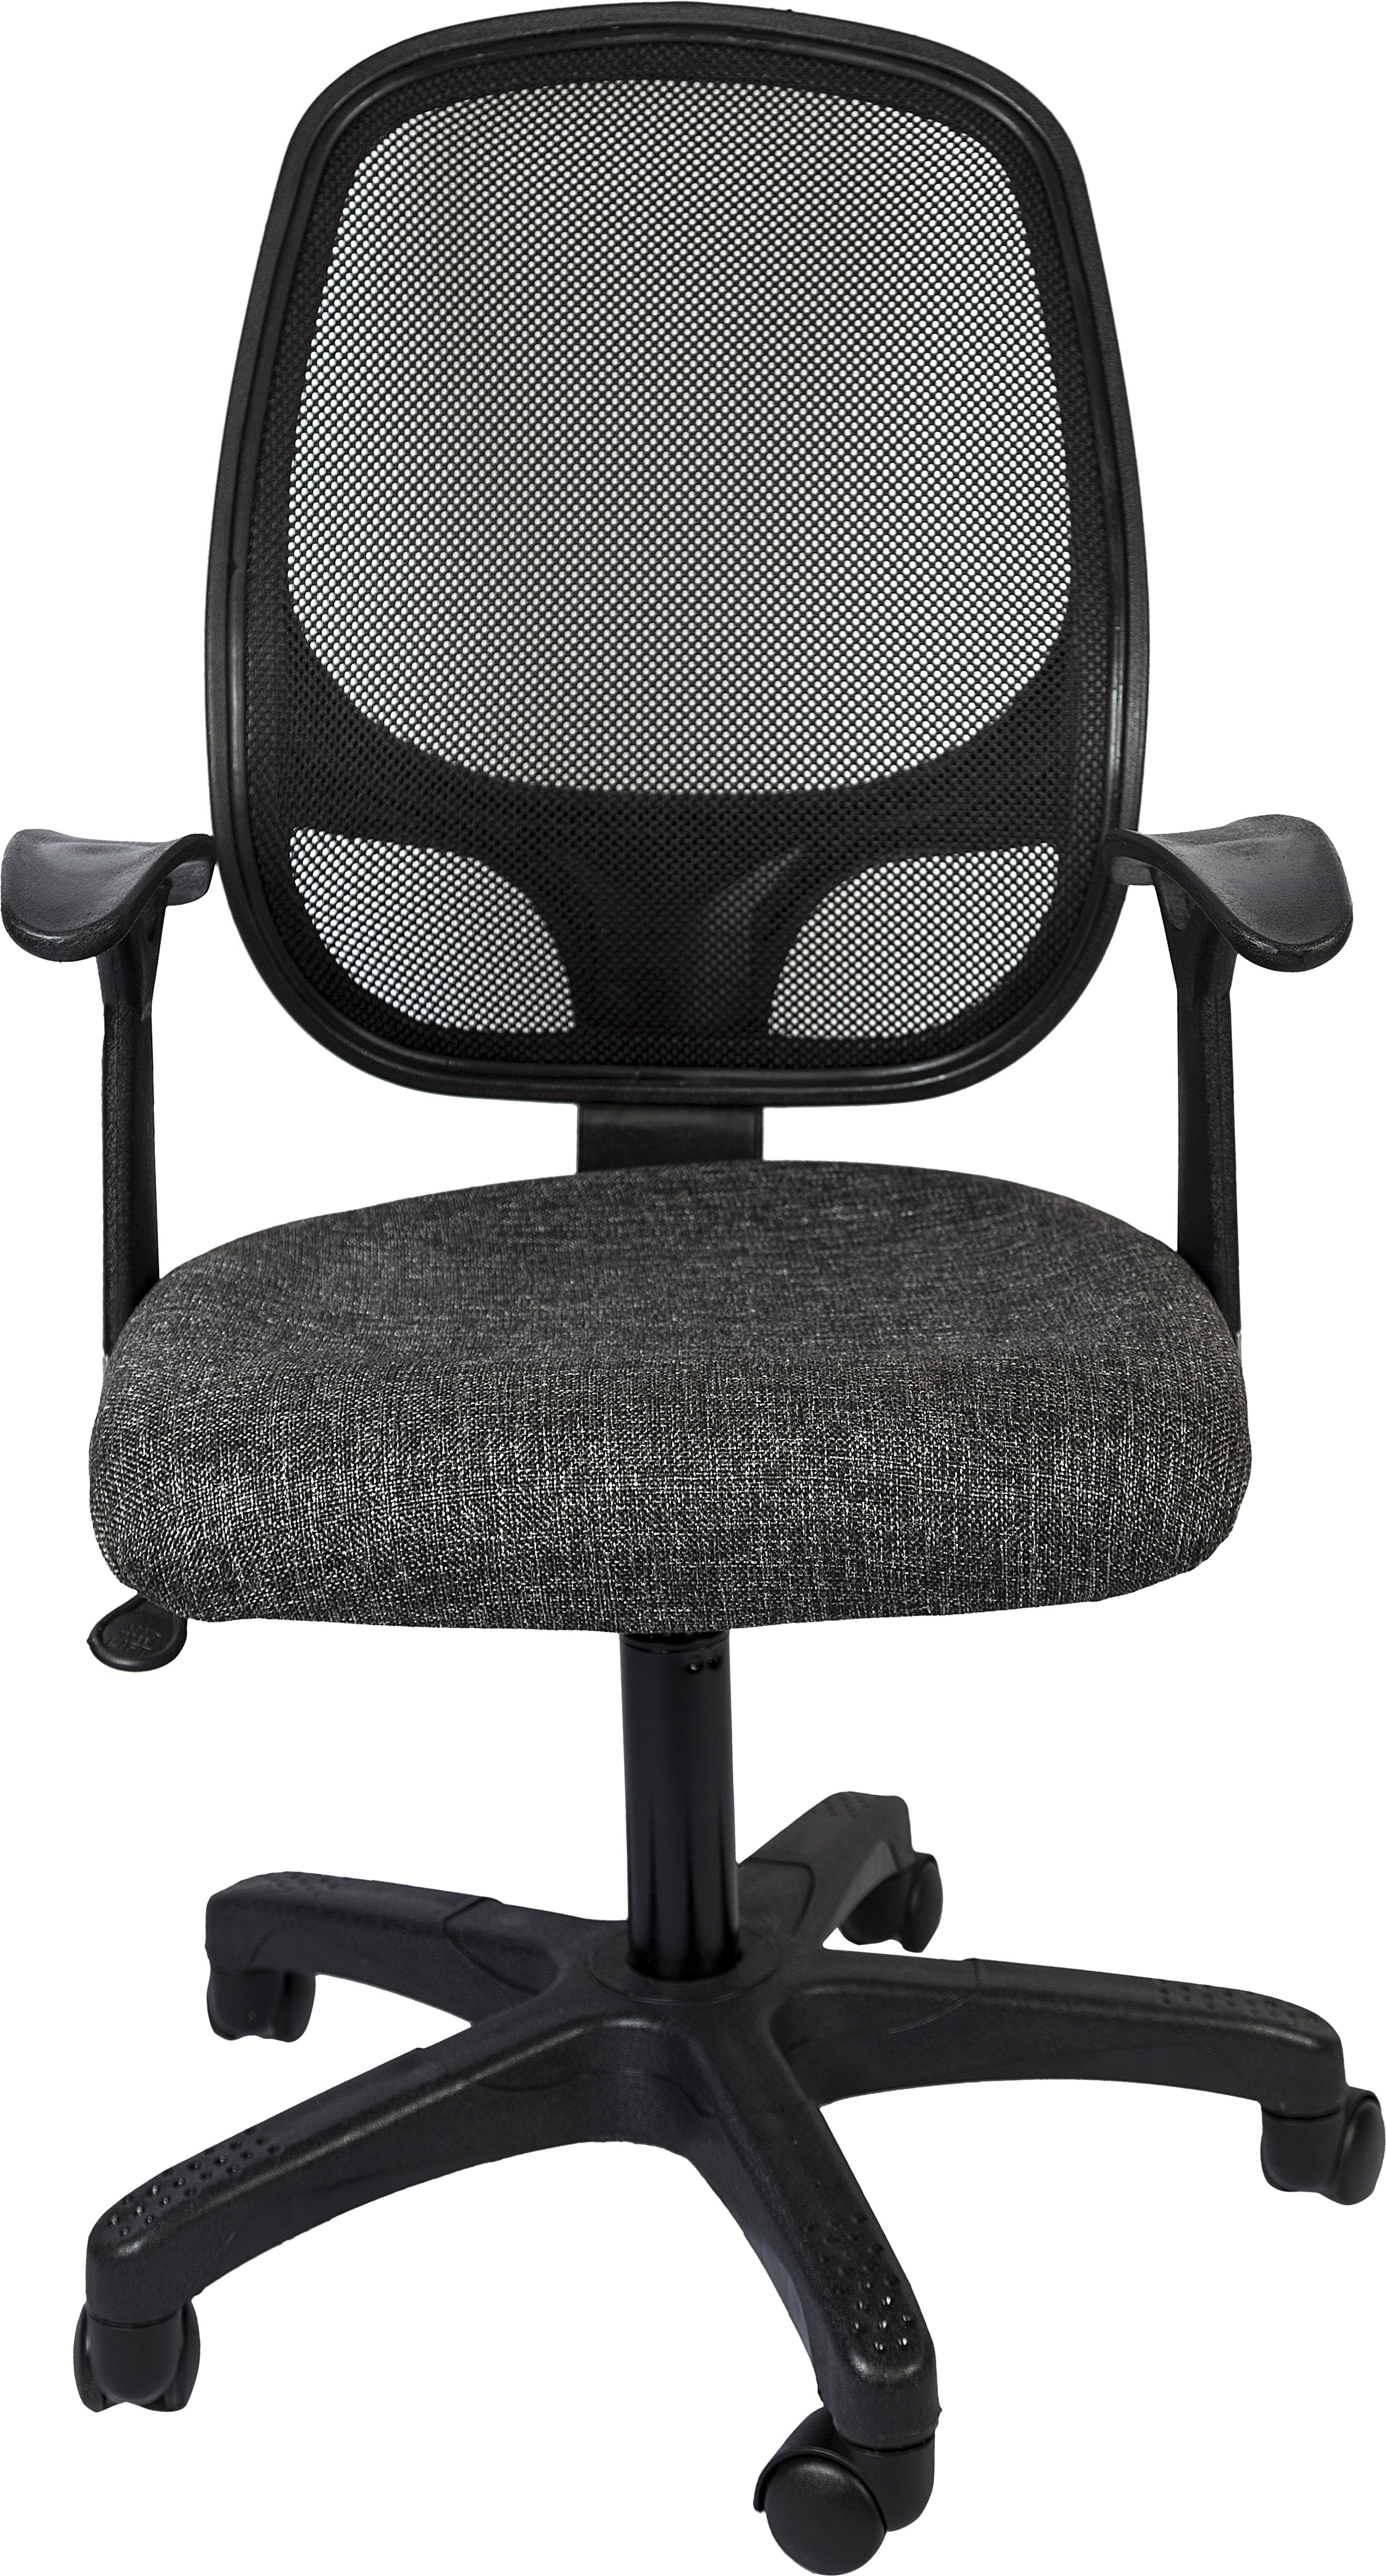 View Hetal Enterprises Synthetic Fiber Office Chair(Black) Furniture (Hetal Enterprises)